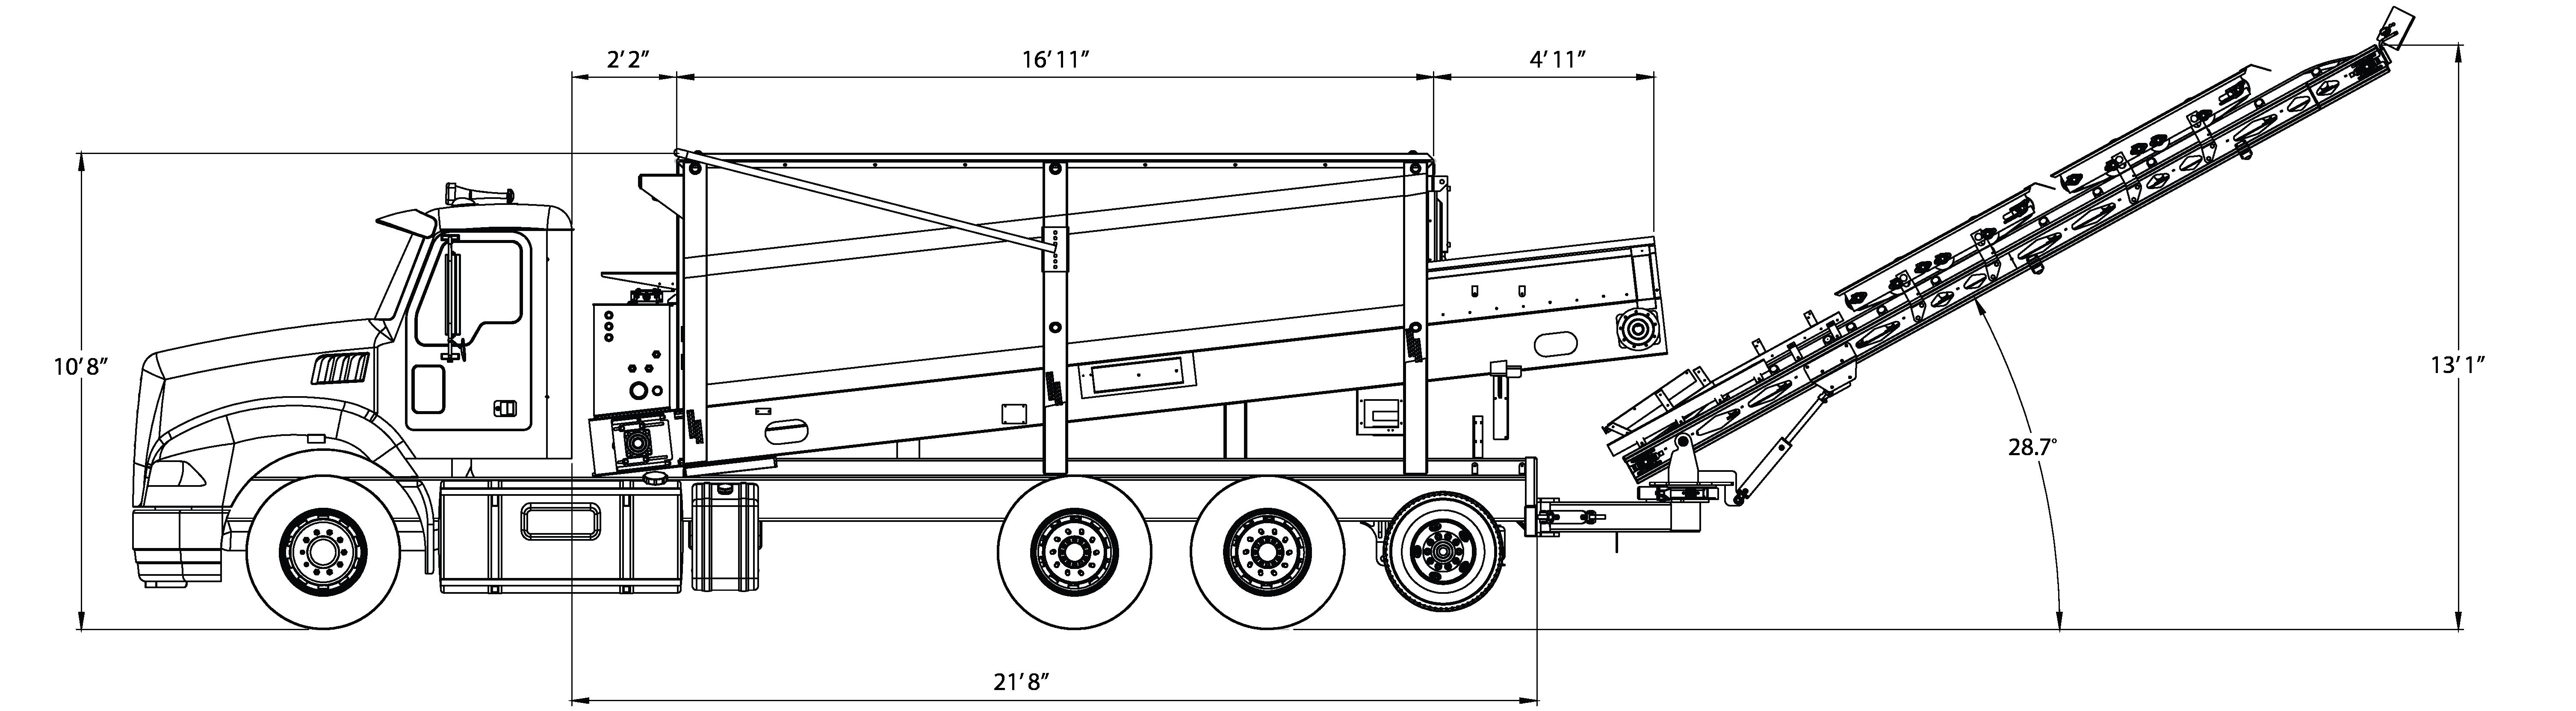 ez-1-01